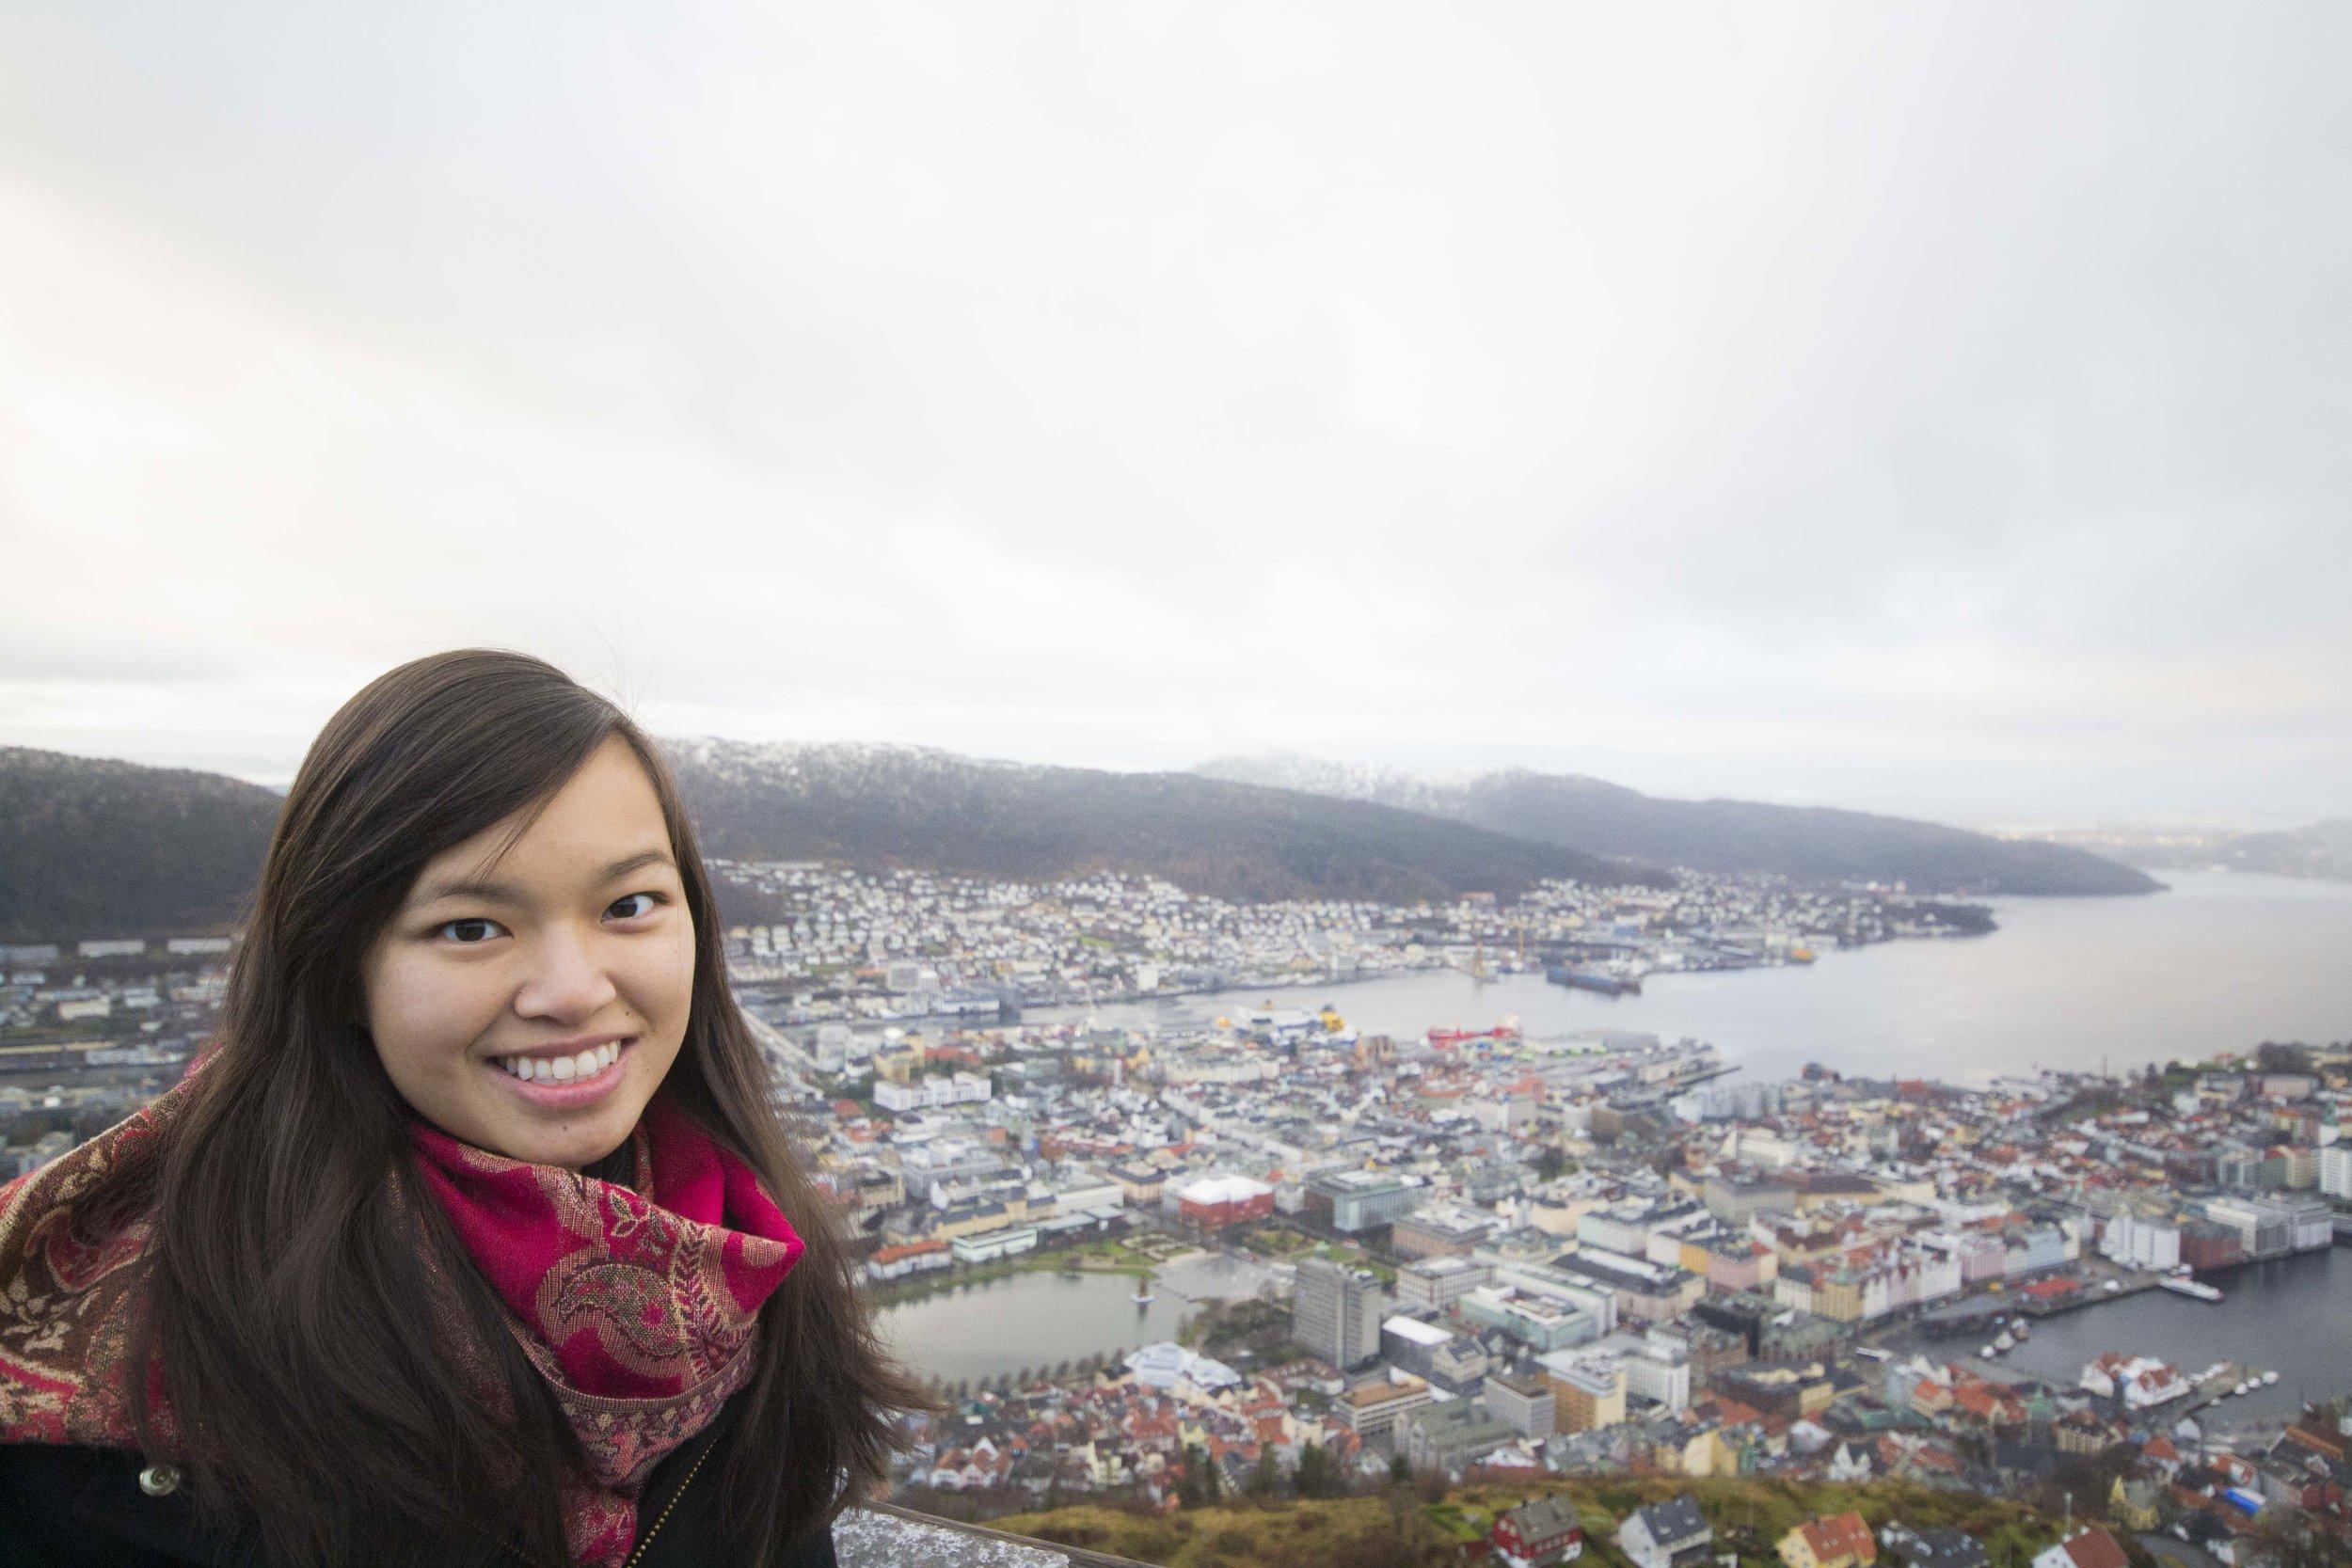 Bergen_151203_0020.JPG